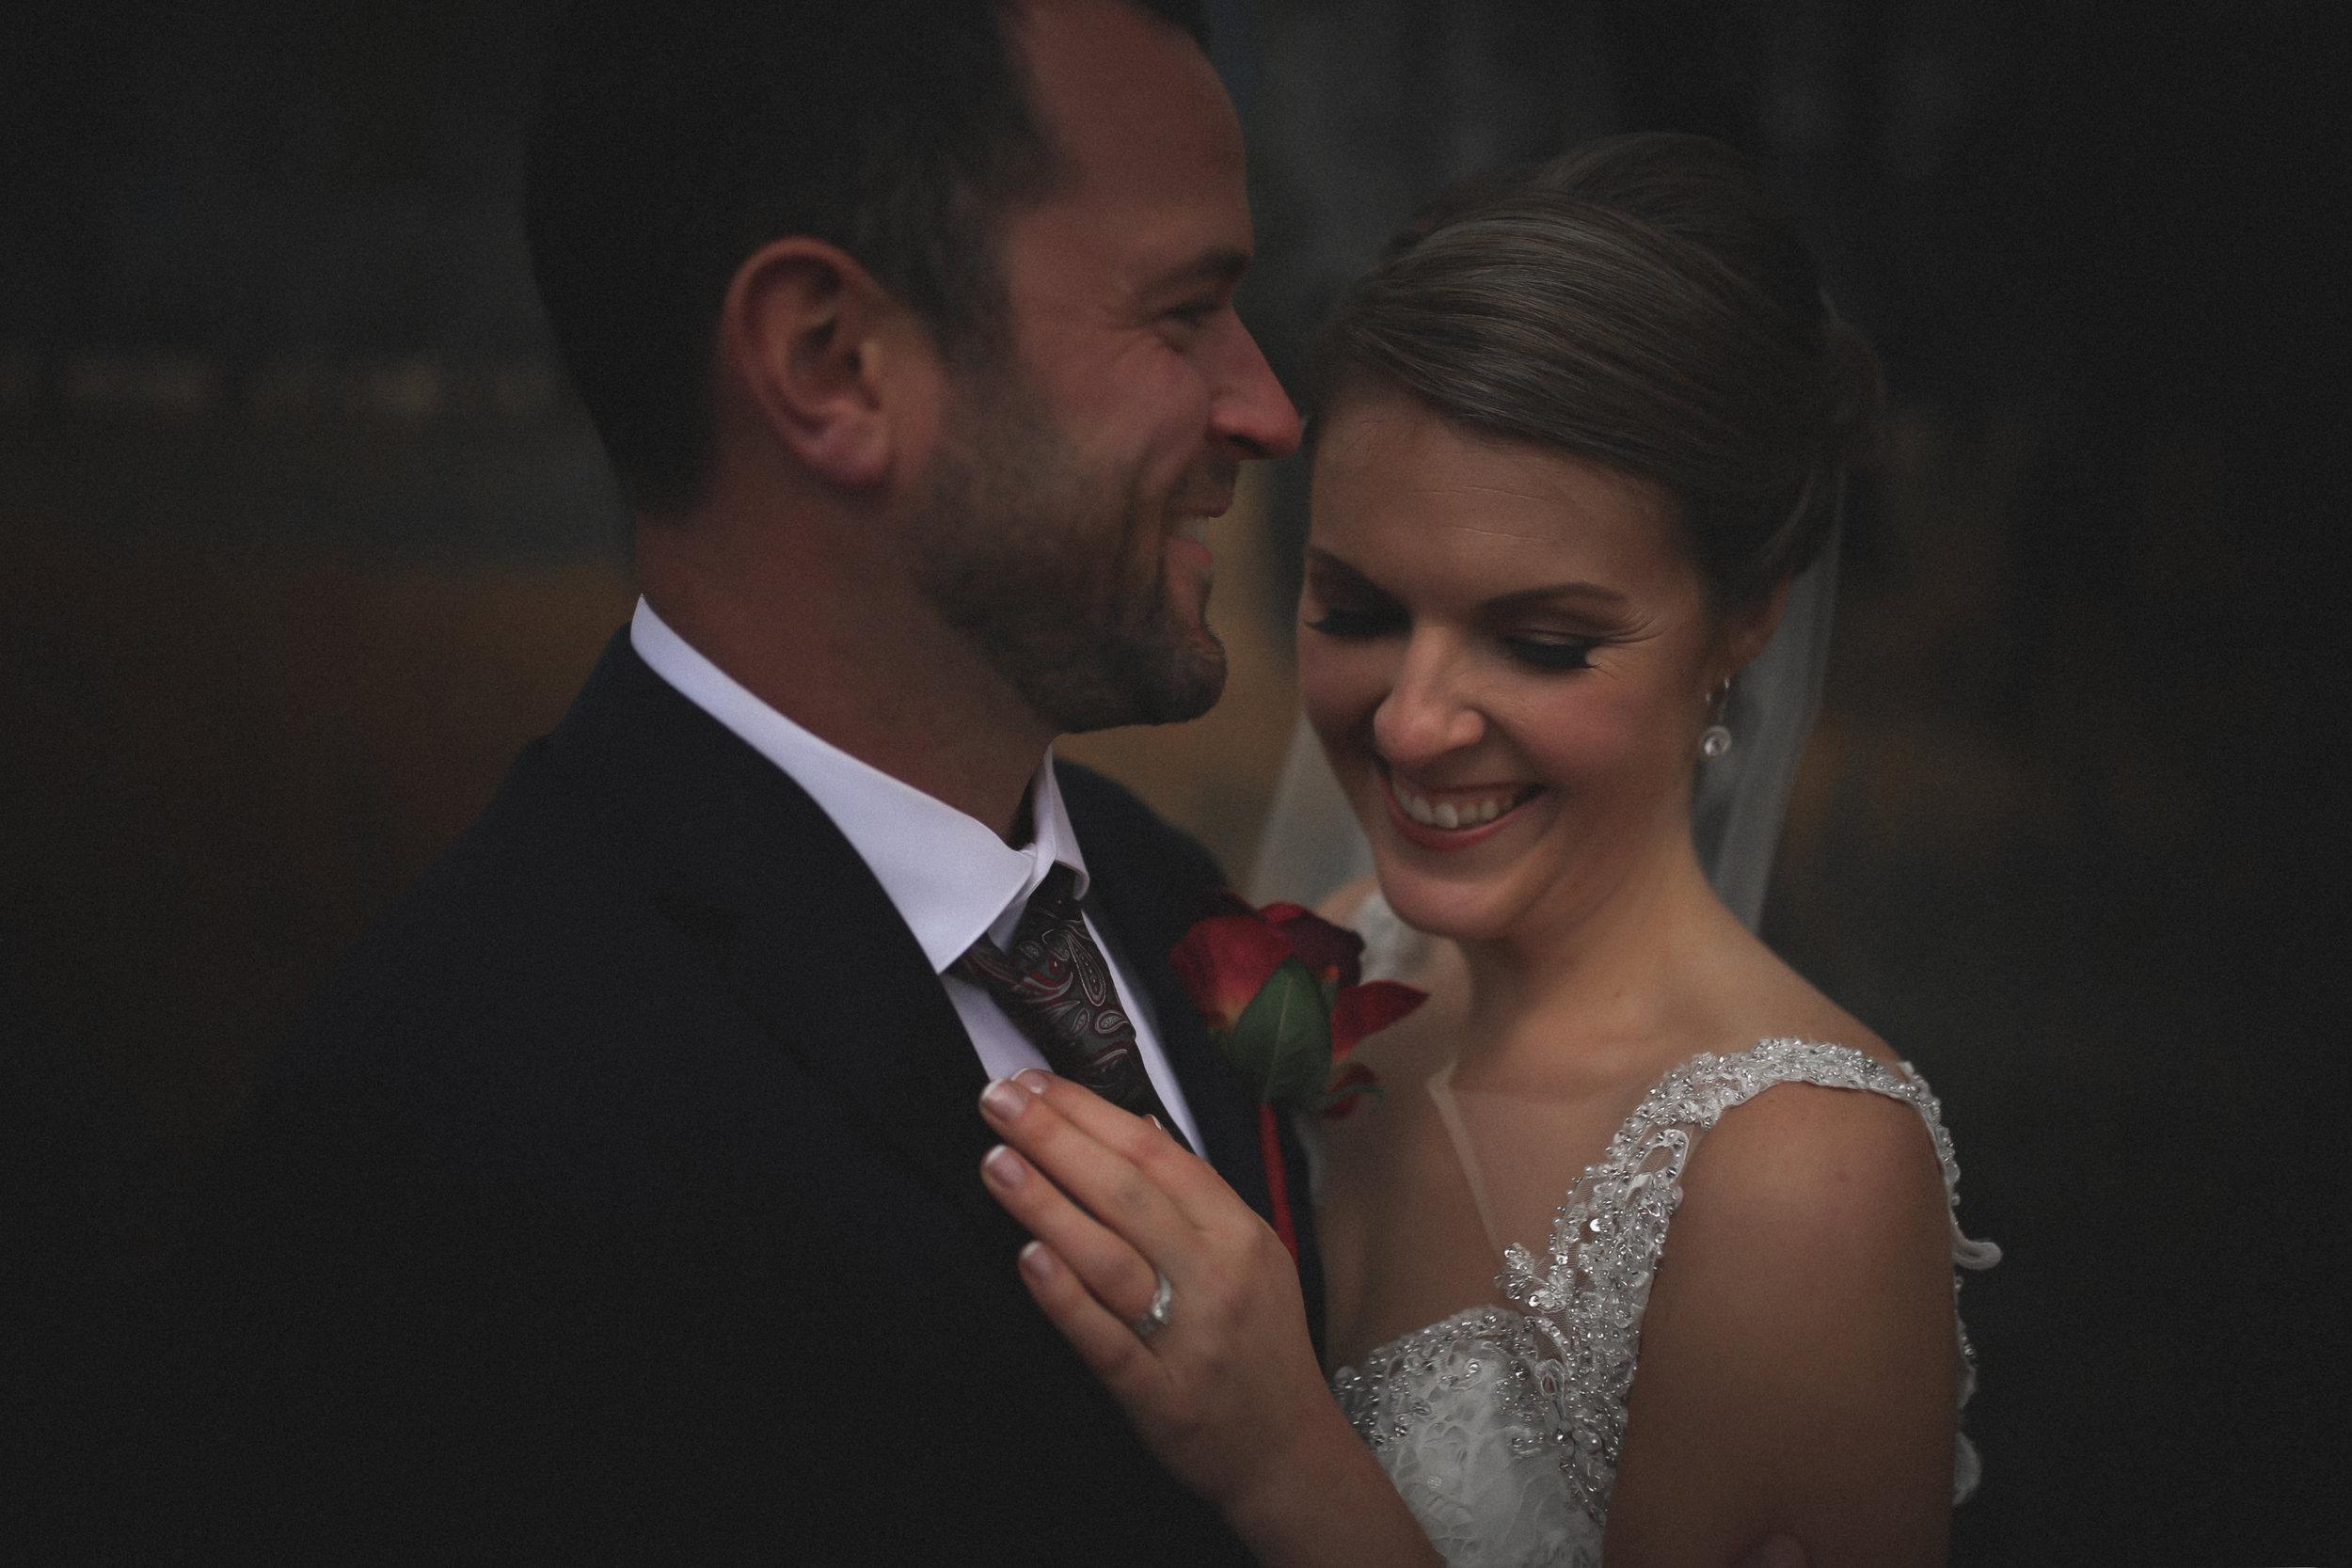 12 Adam Ziorio Photography - Vitoria wedding photographer Nick&Bree Fernie Wedding.jpg